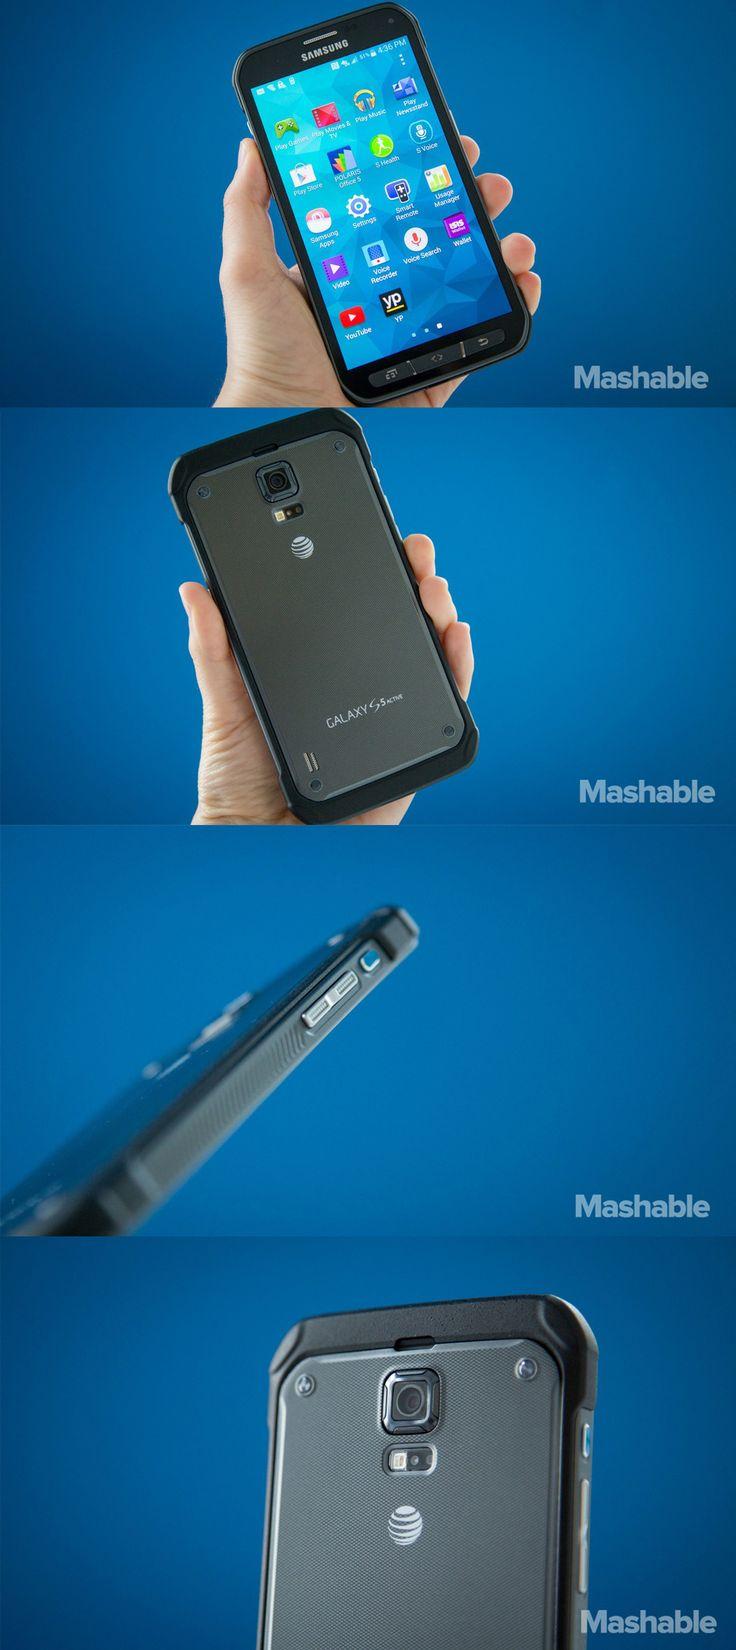 The Samsung Galaxy S5 Active.